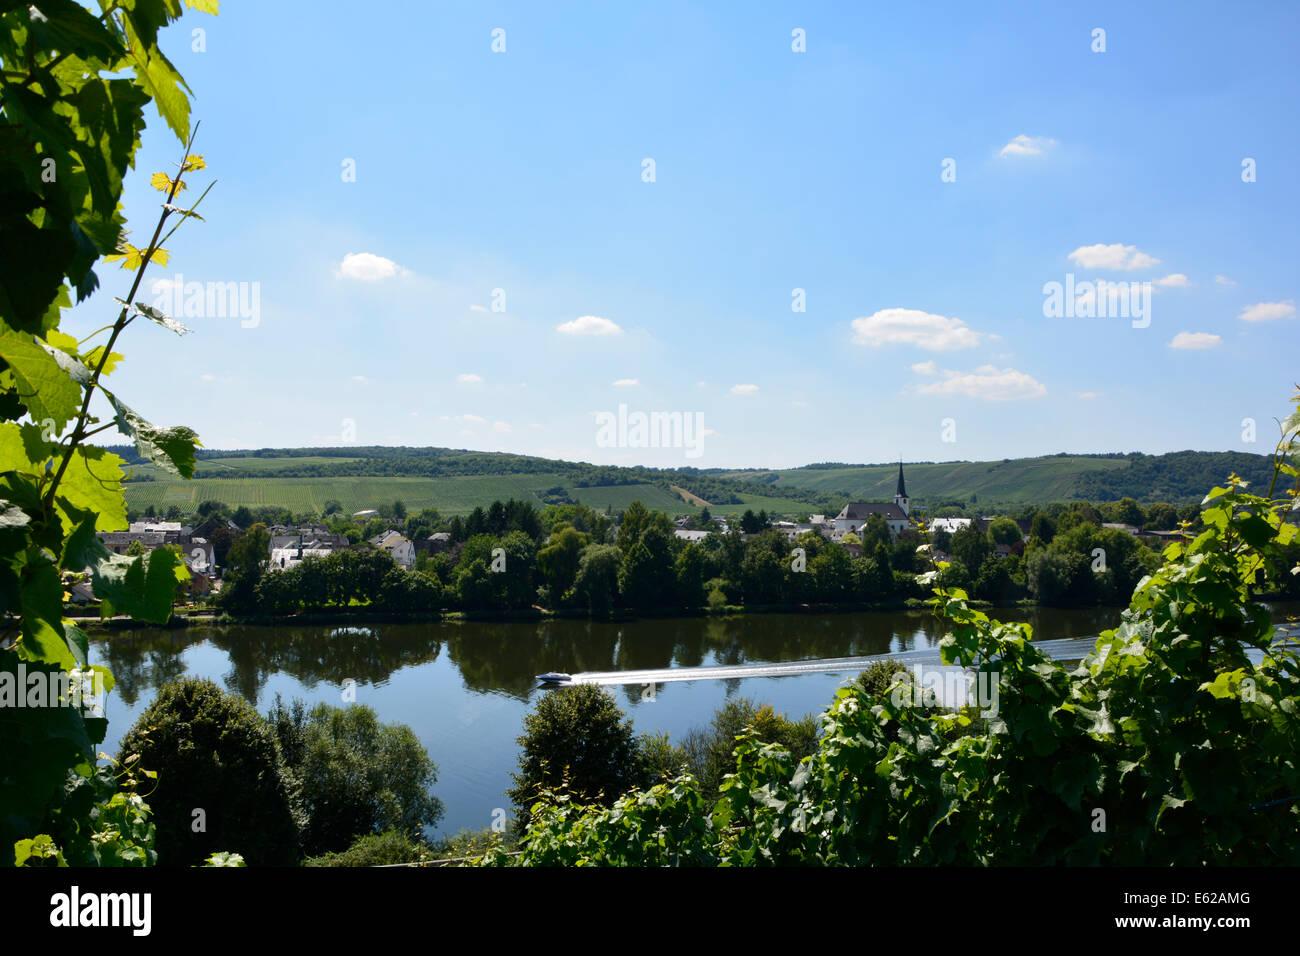 Longuich Moselle river valley landscape with blue sky Germany Mosel Römische Weinstrasse Schweich Moseltal blauer Himmel Fluss Stock Photo